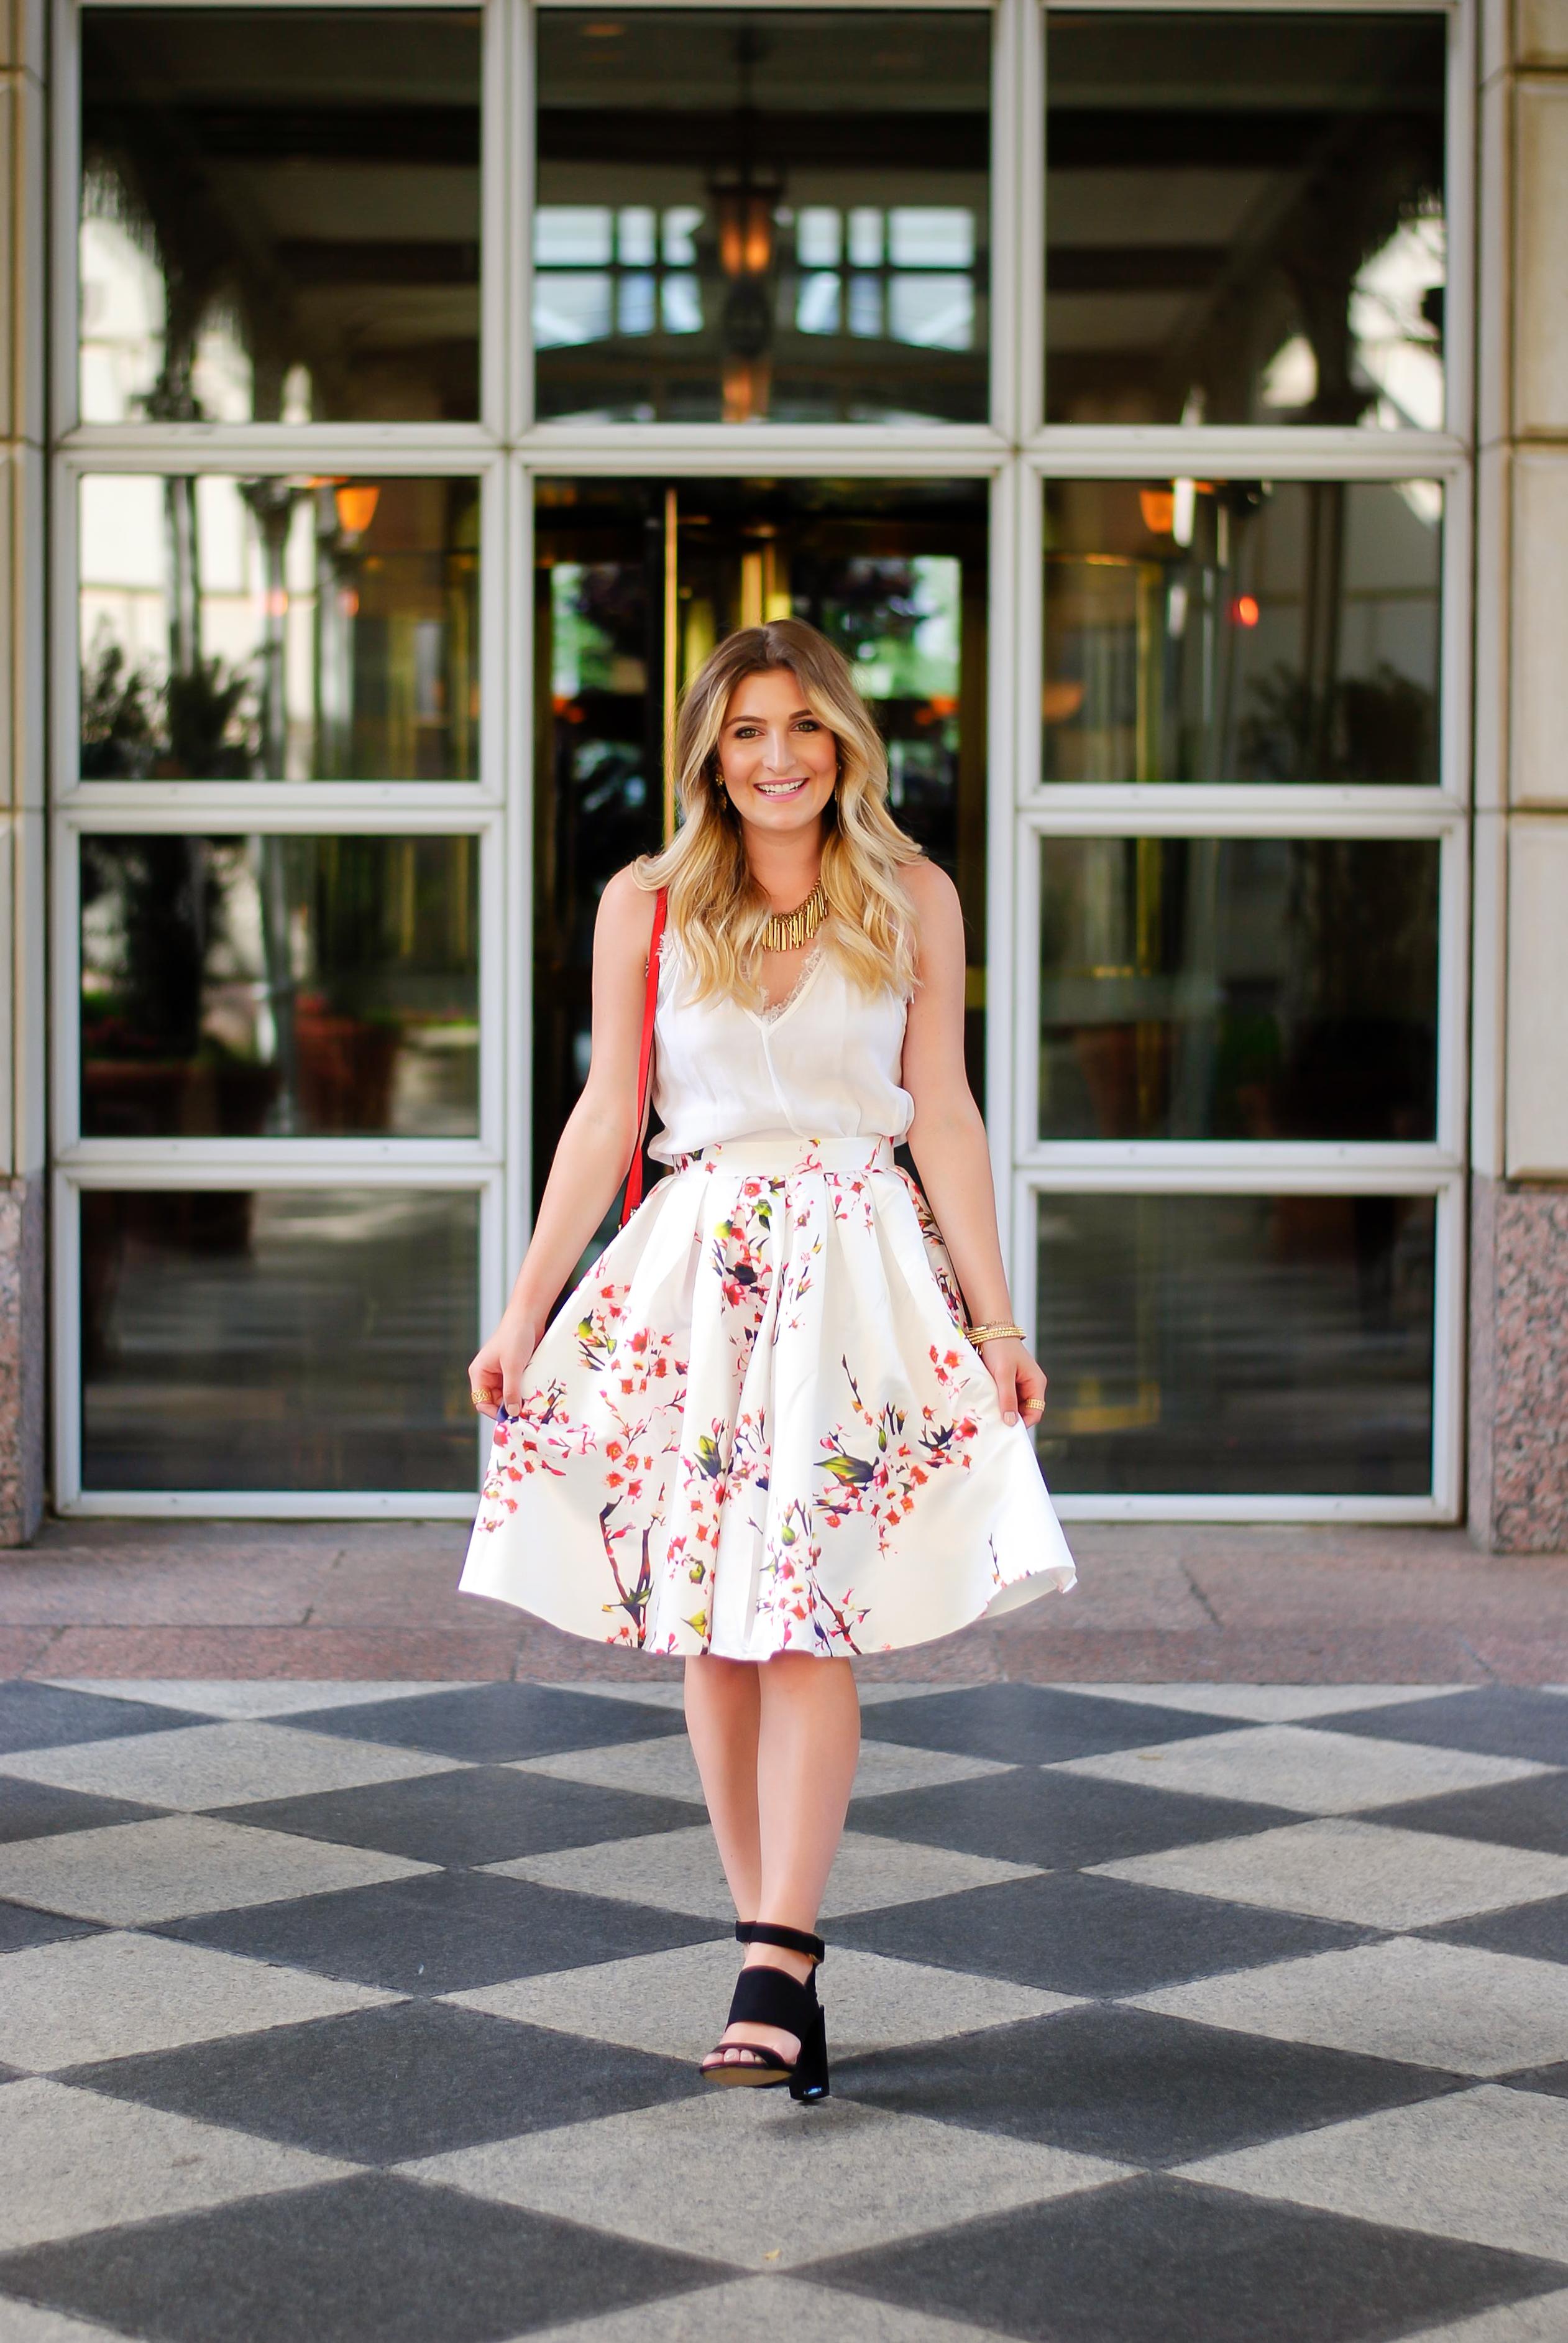 floral summer skirt and light summer top | Audrey Madison Stowe Blog